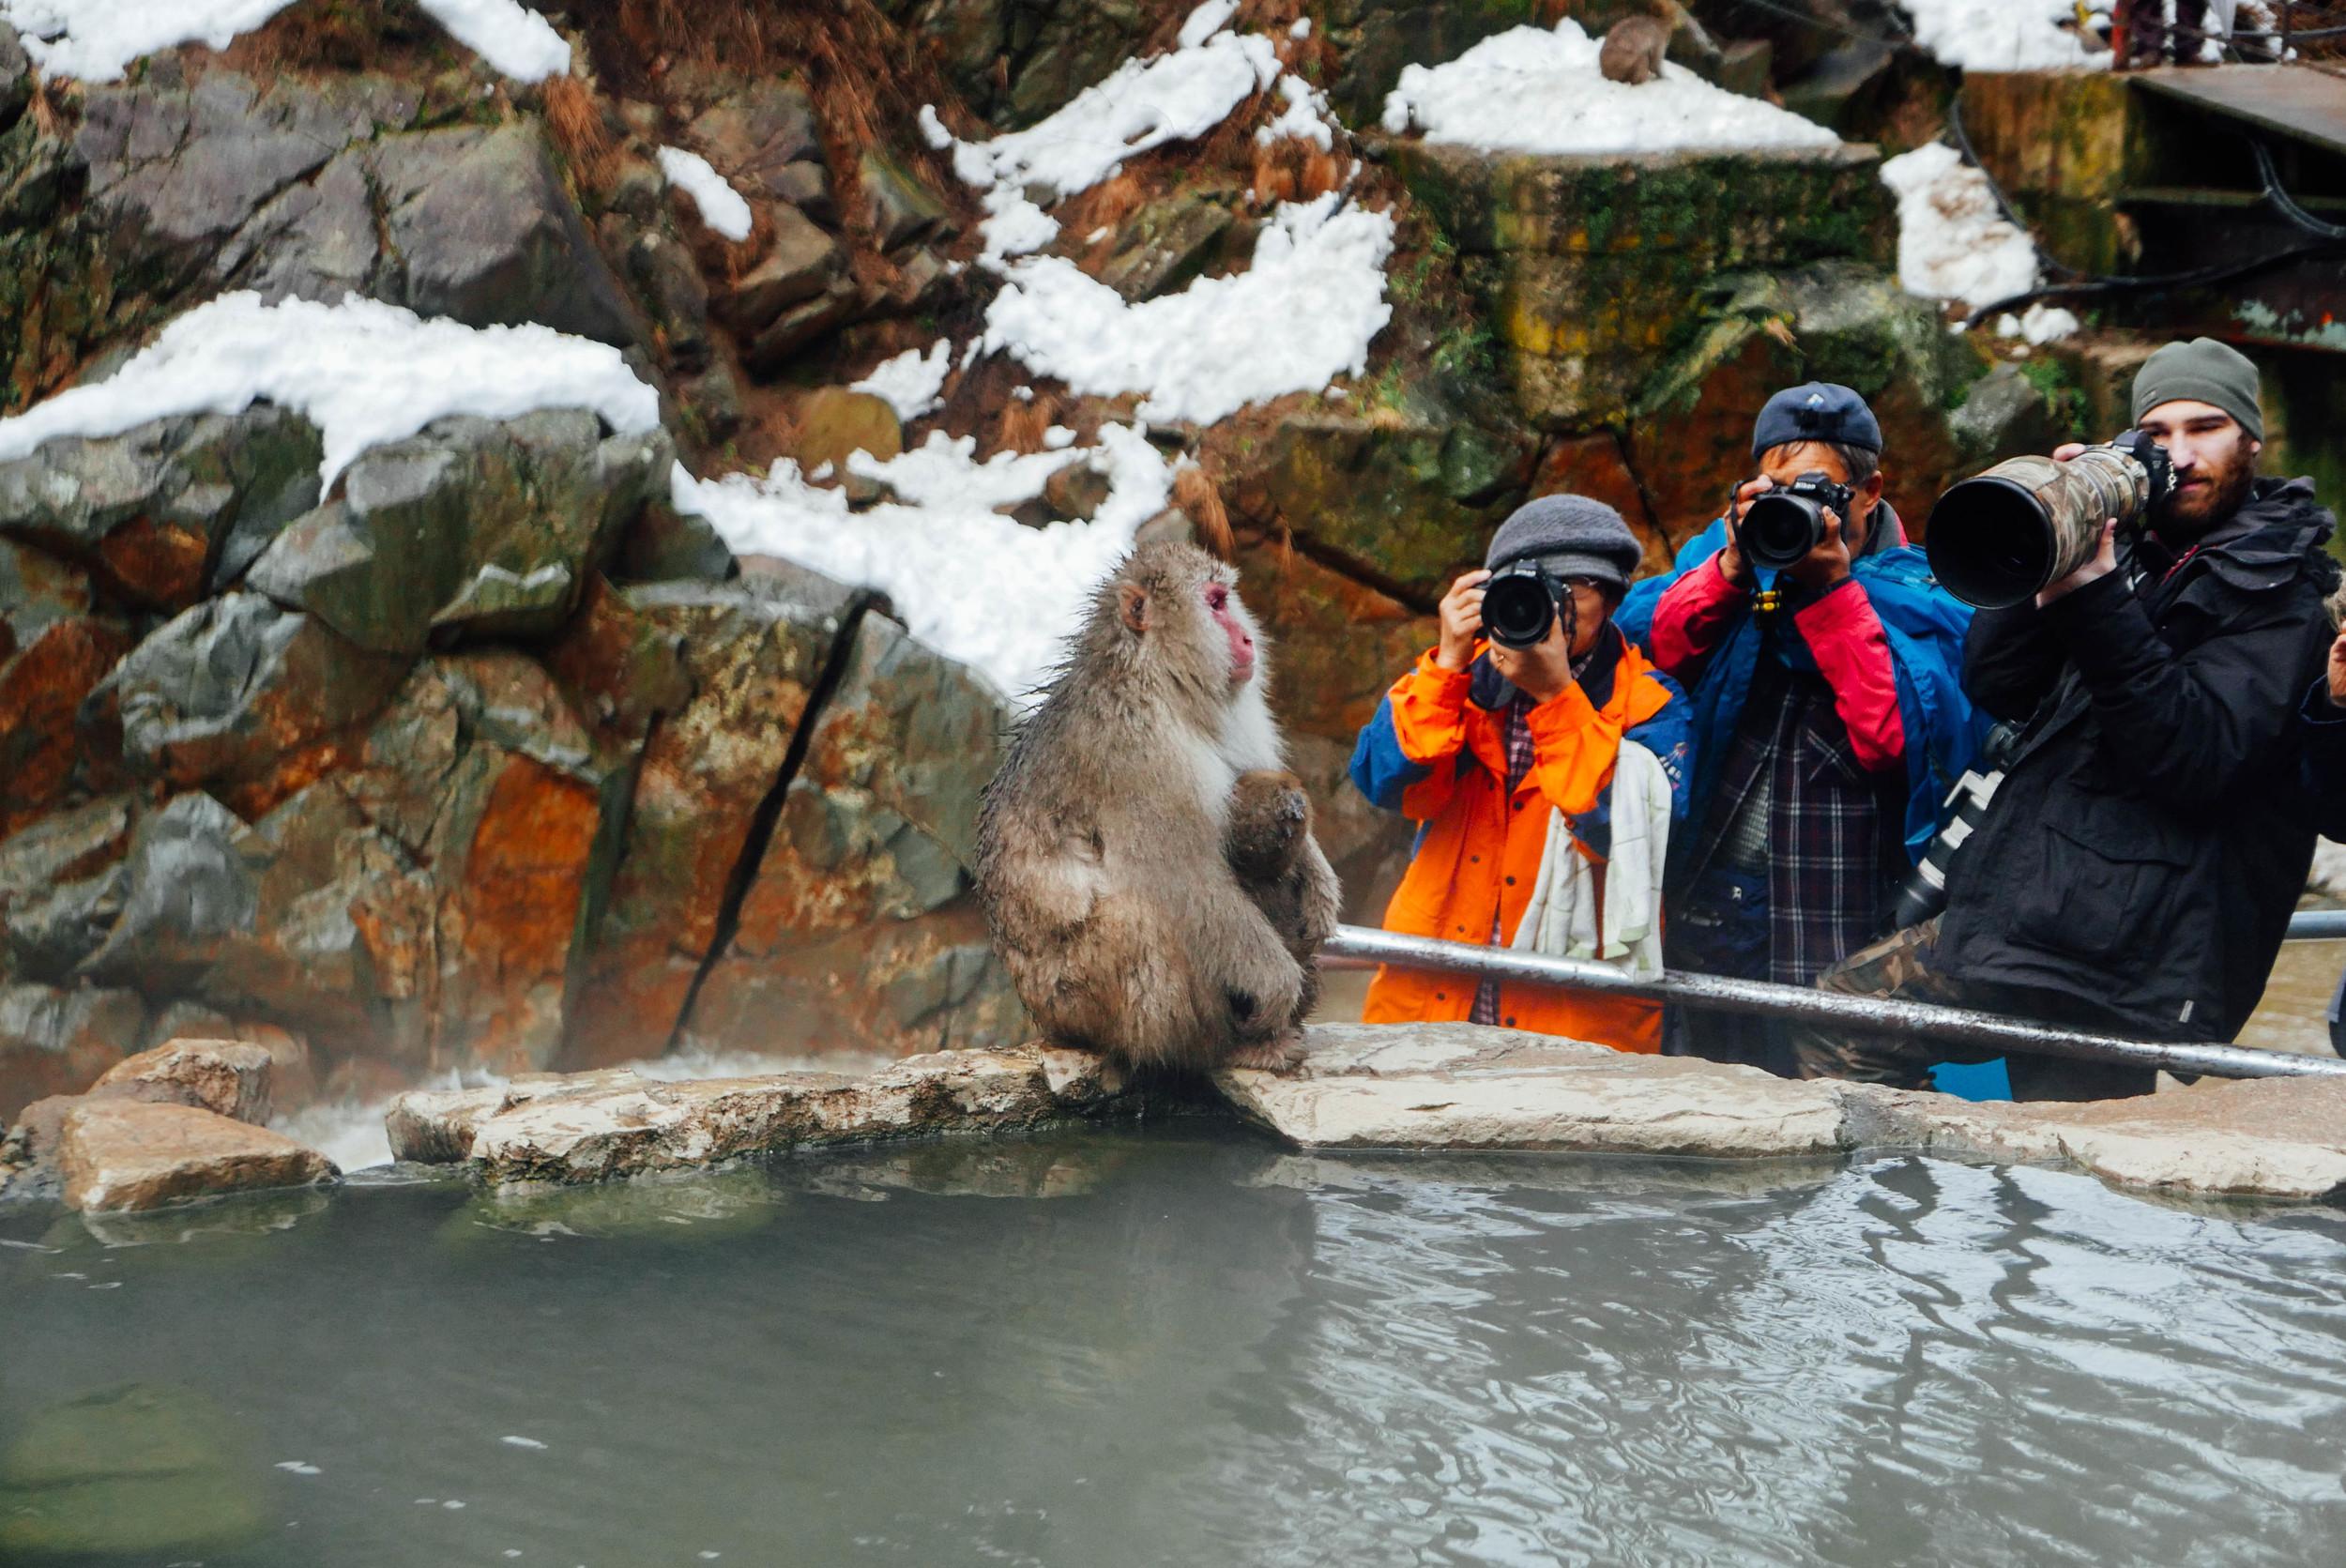 snow-monkey-park-photographers.jpg